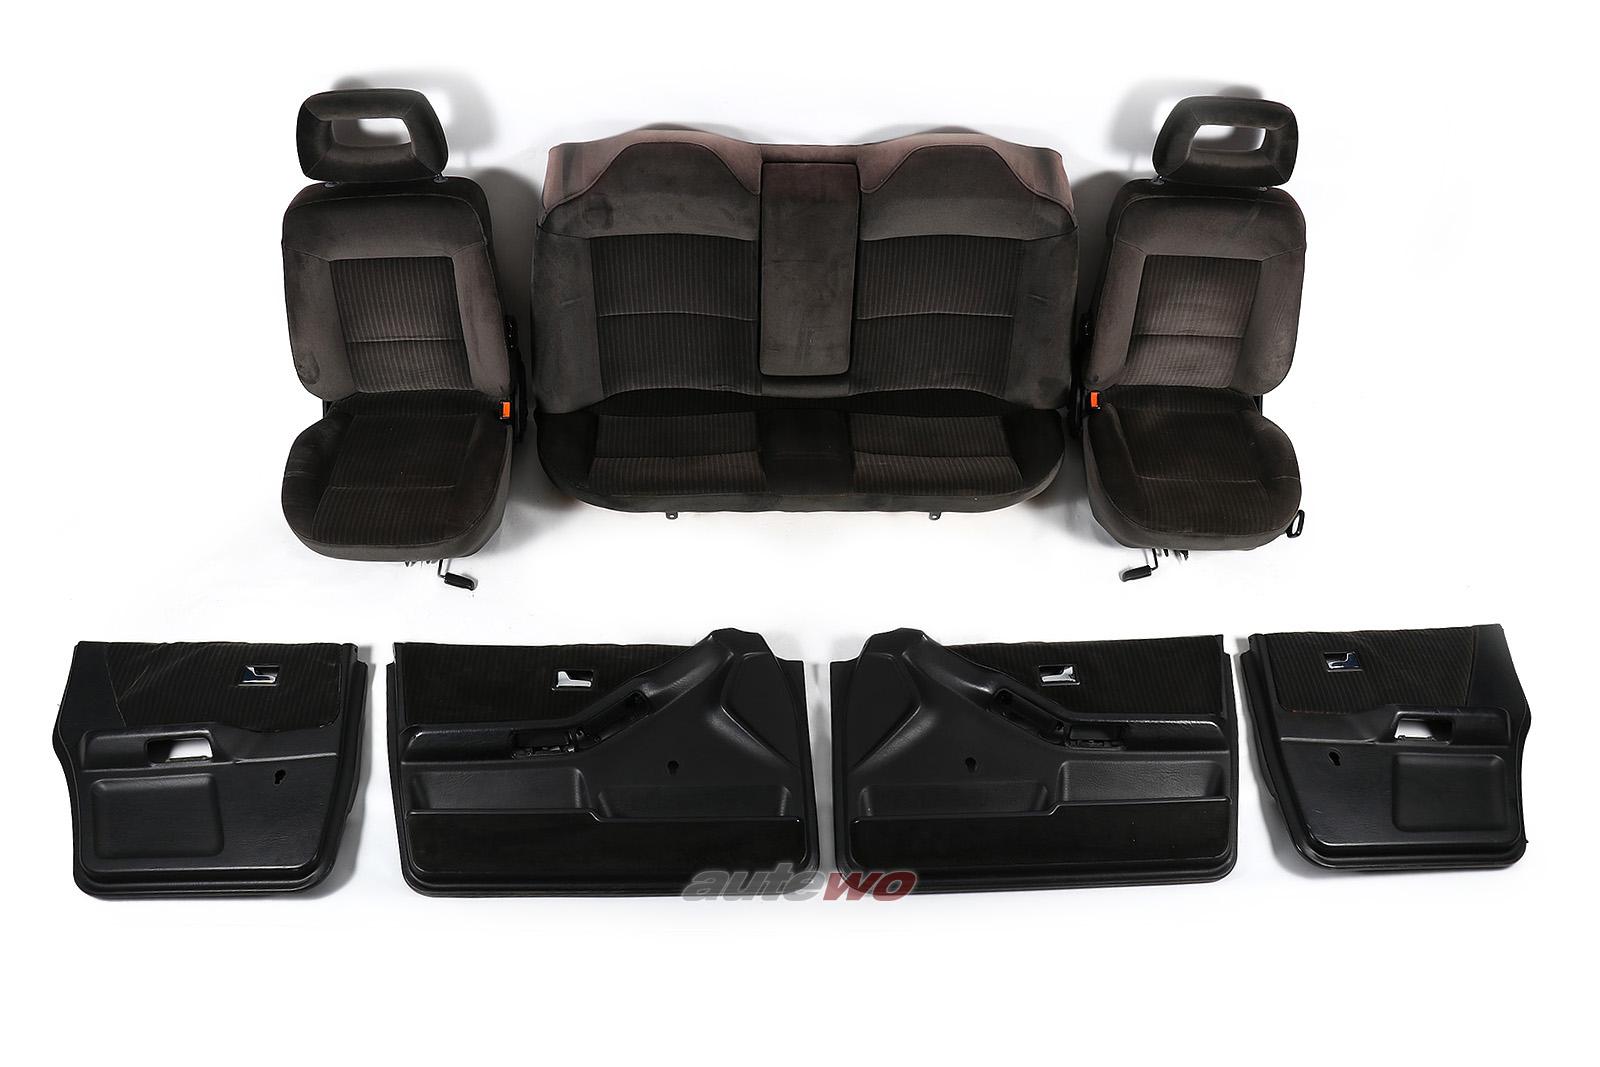 Audi 80/90 Typ 89 Innenausstattung Sitze/Rücksitzbank/Türverkleidungen braun